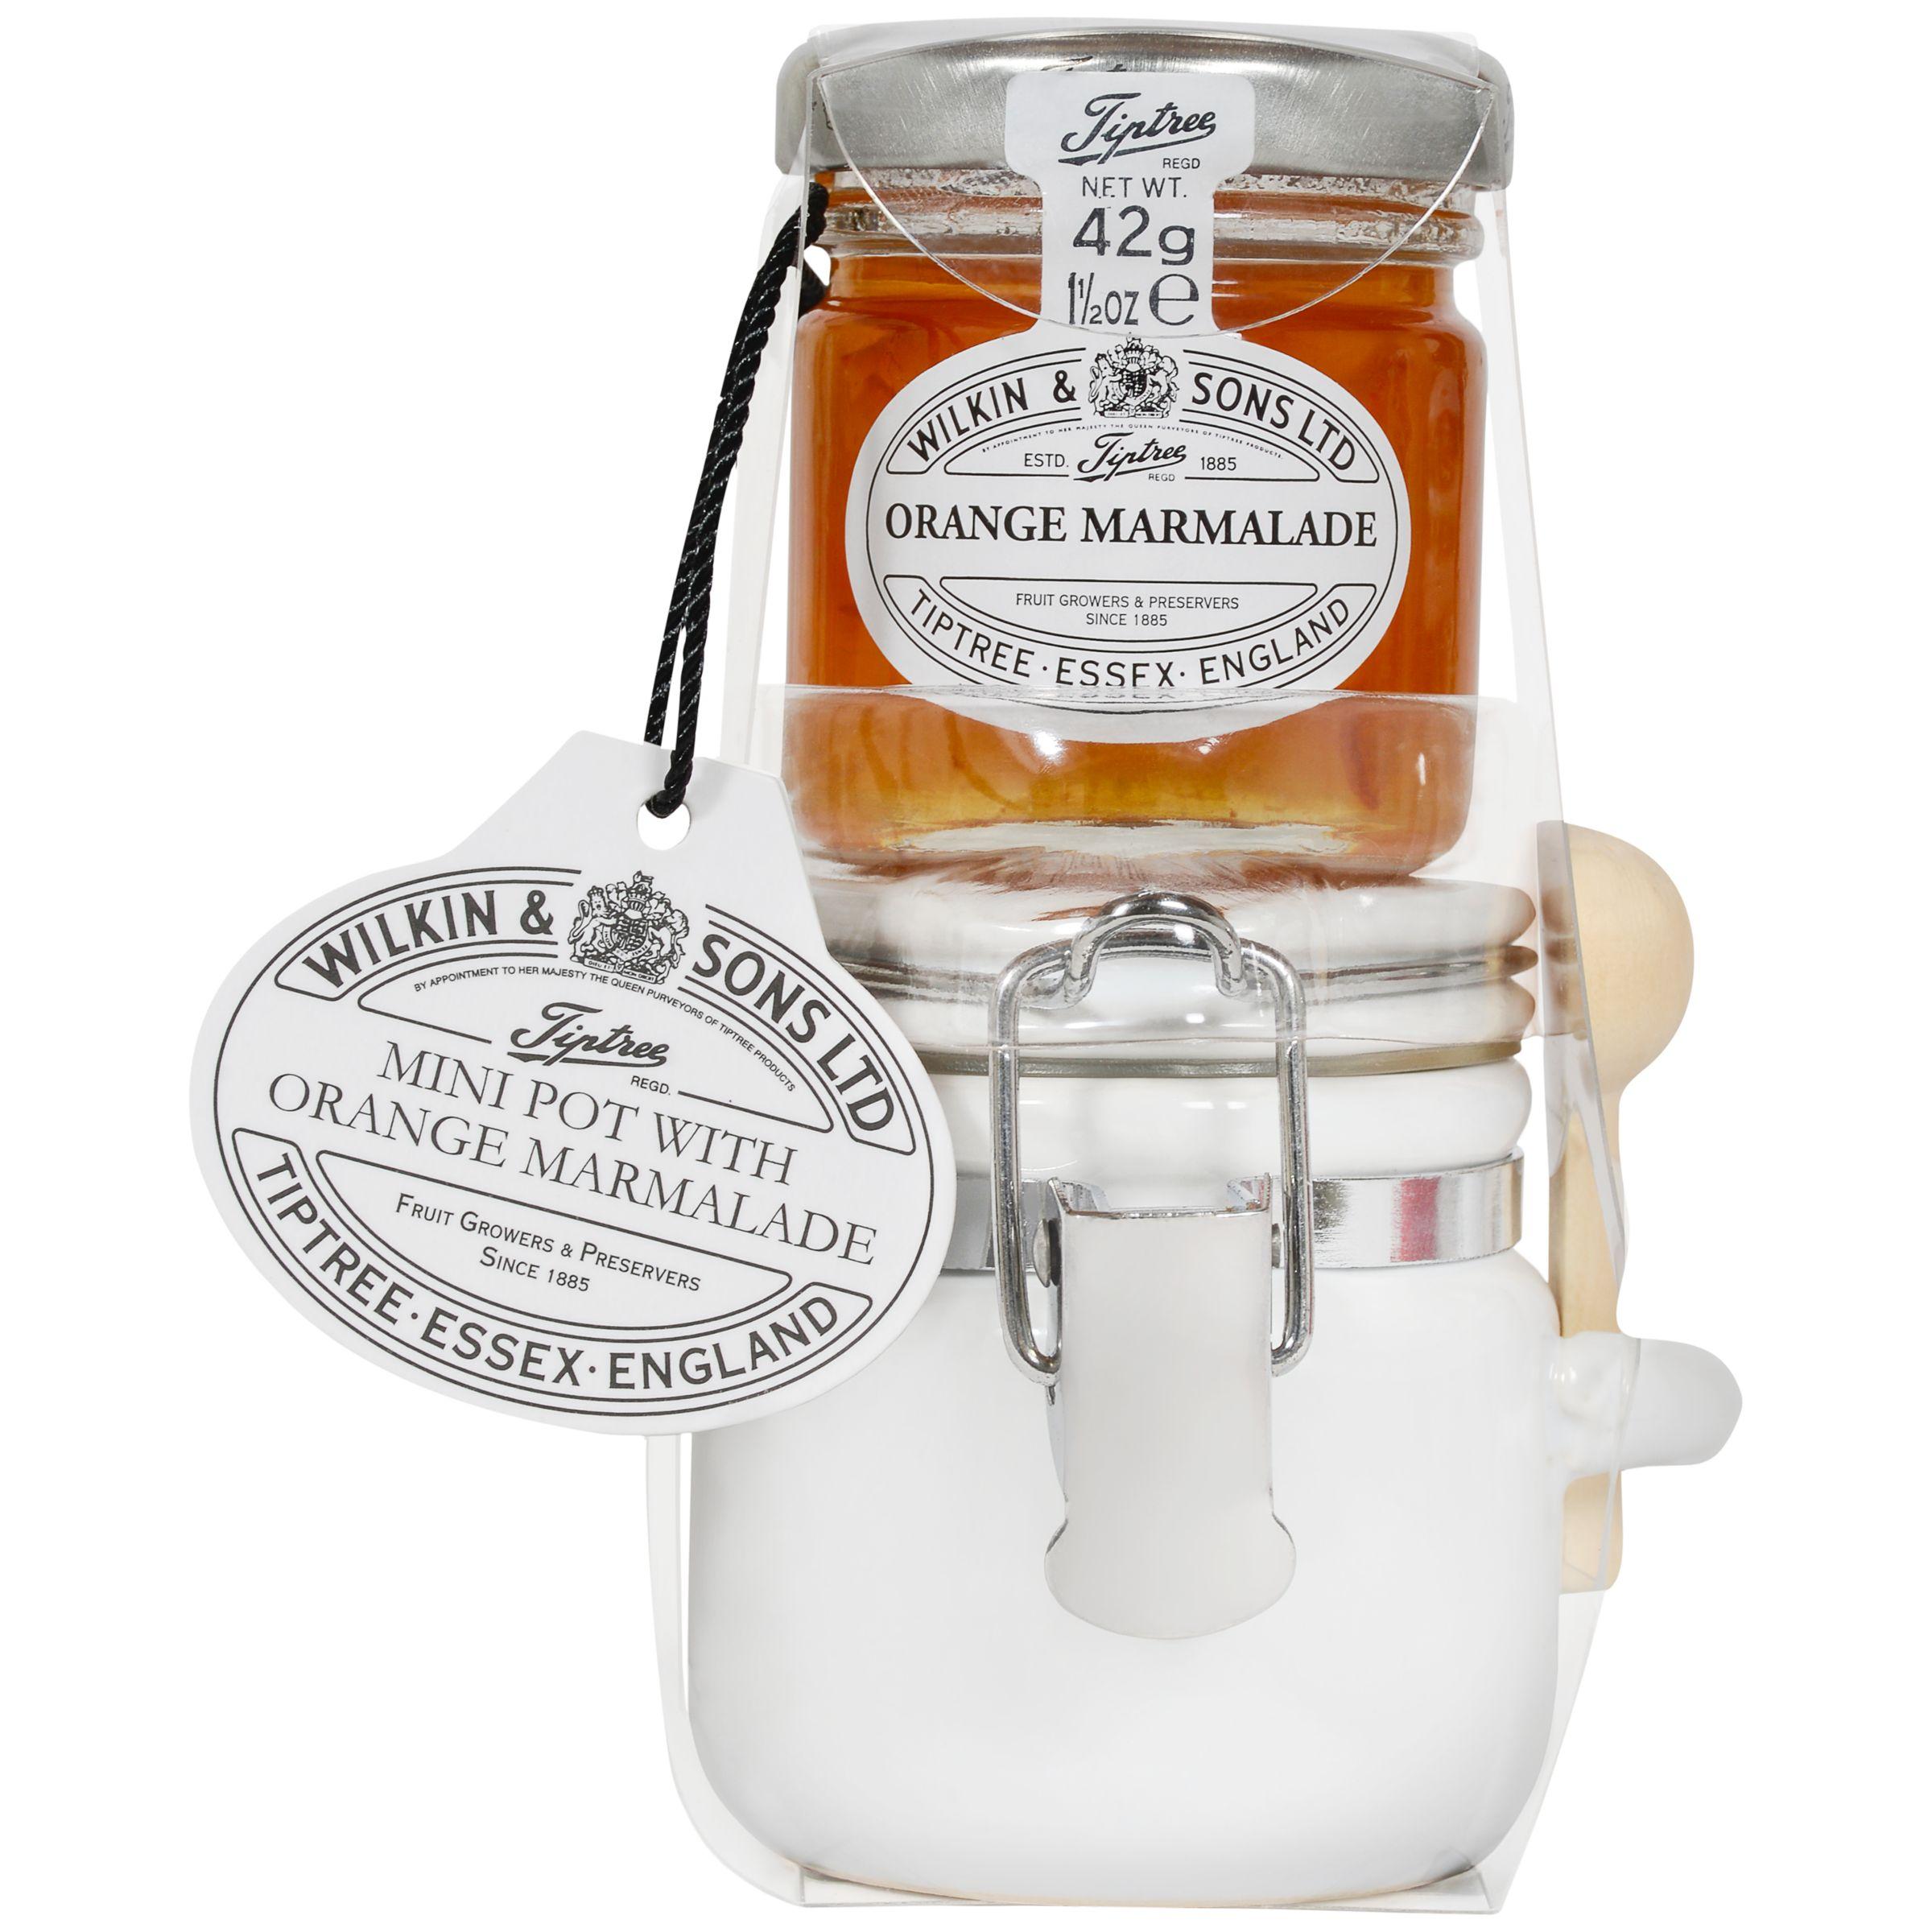 Wilkin & Sons Wilkin & Sons Tiptree Mini Pot with Orange Marmalade Set, 42g